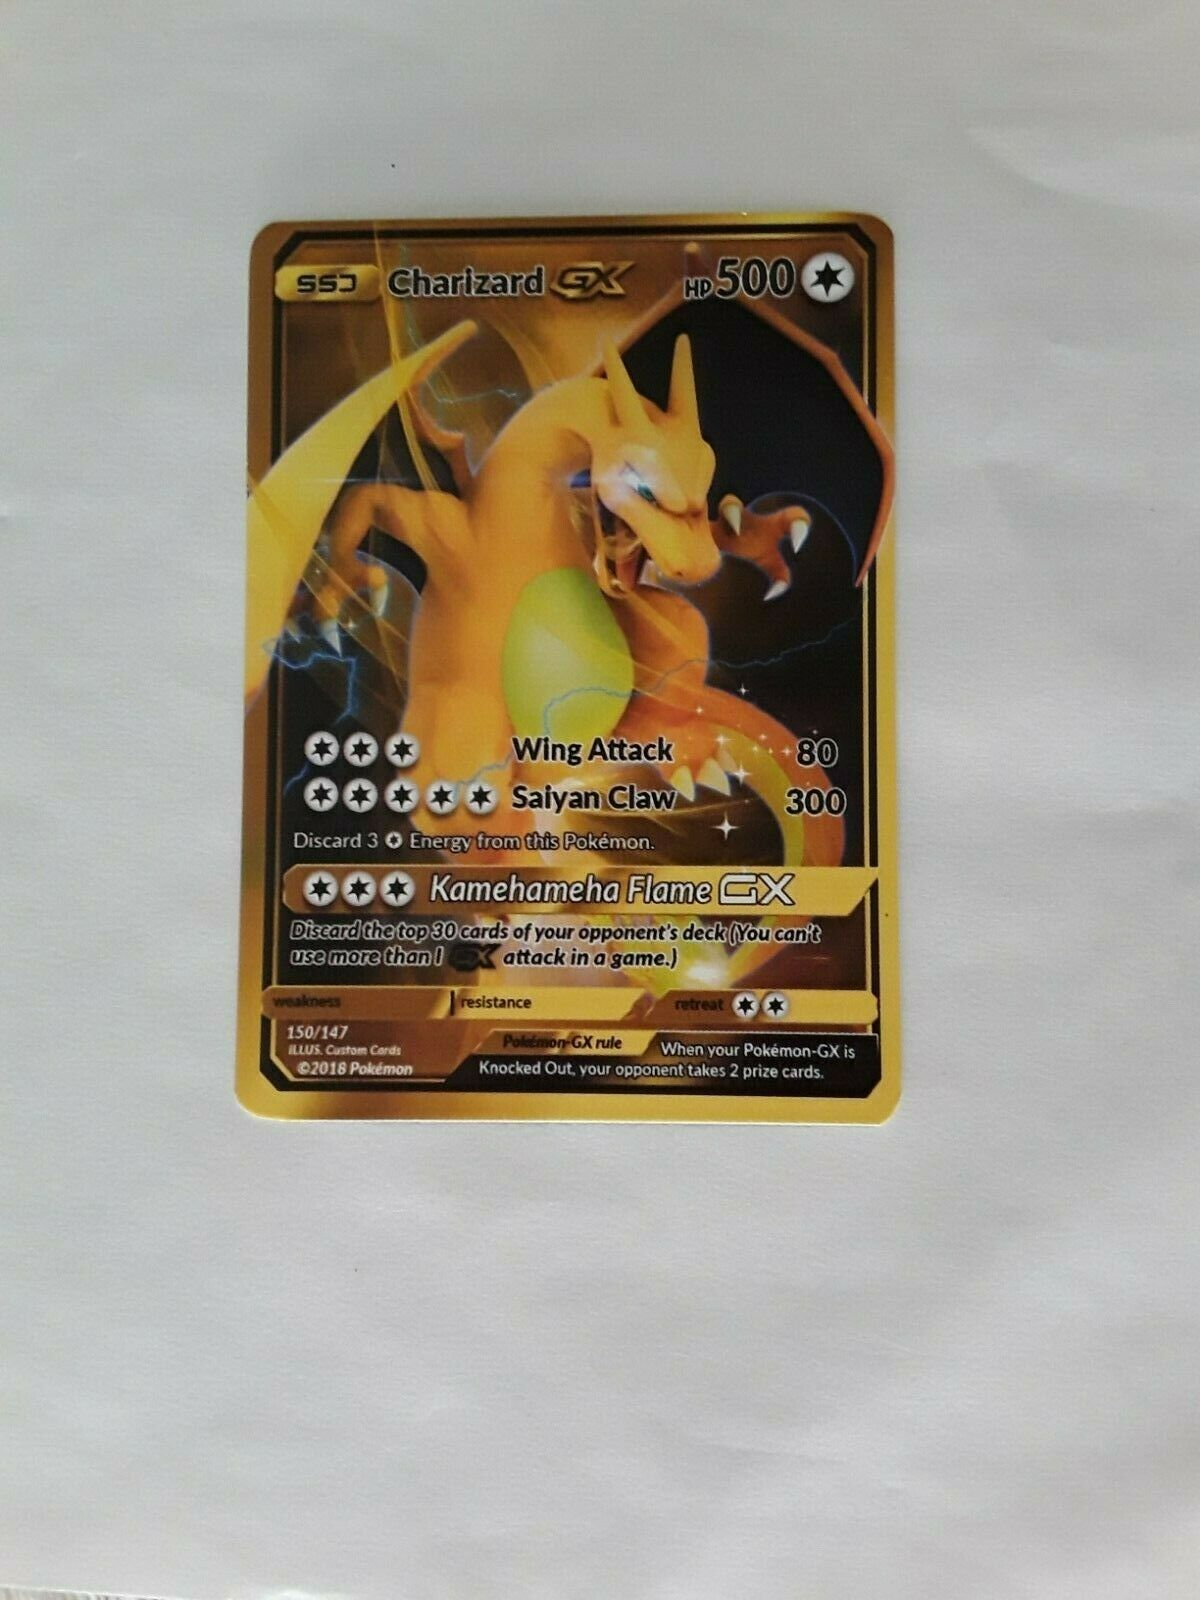 Pokemon Card Gold Charizard Gx Pokemon Cards Ideas Of Pokemon Cards Pokemoncard Pokemon Pokemon Card Gol In 2020 Pokemon Cards Pokemon Pokemon Cards For Sale